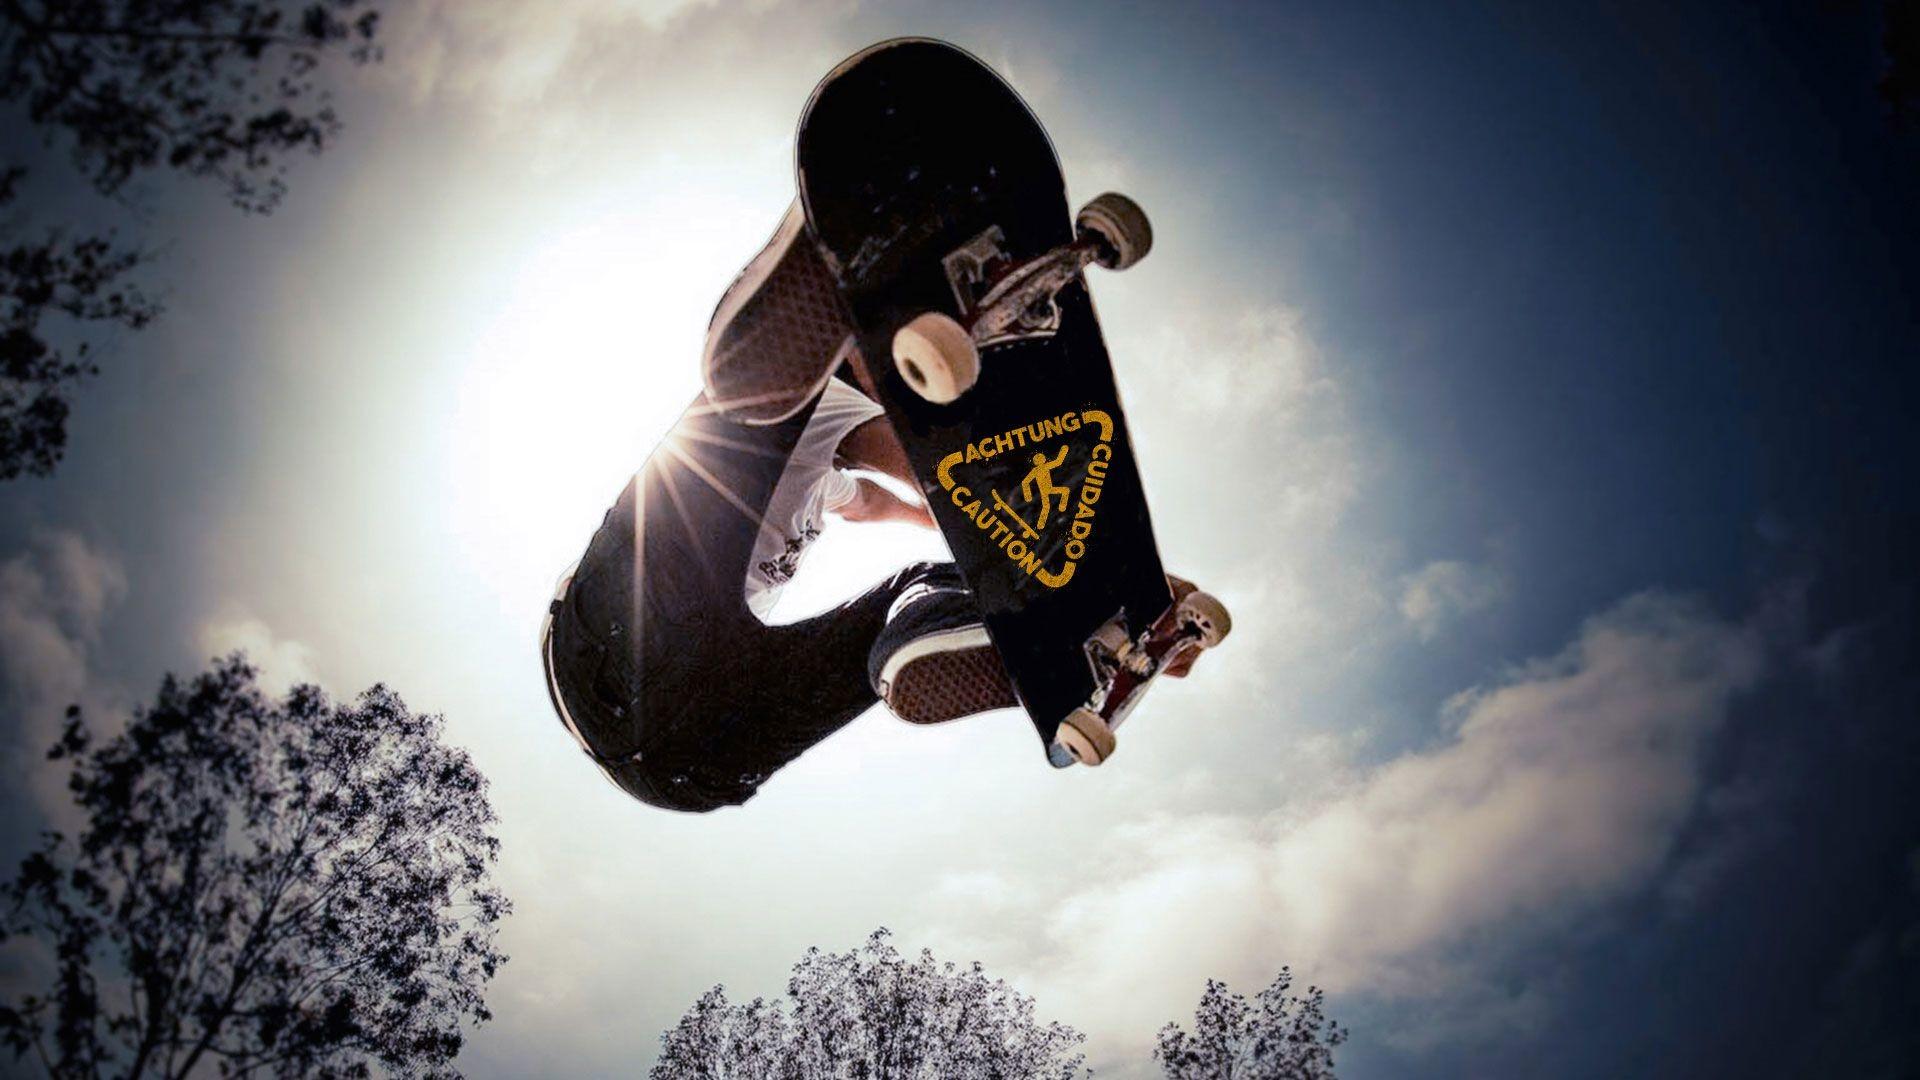 2816x2112 BGirl Skateboard Wallpaper B